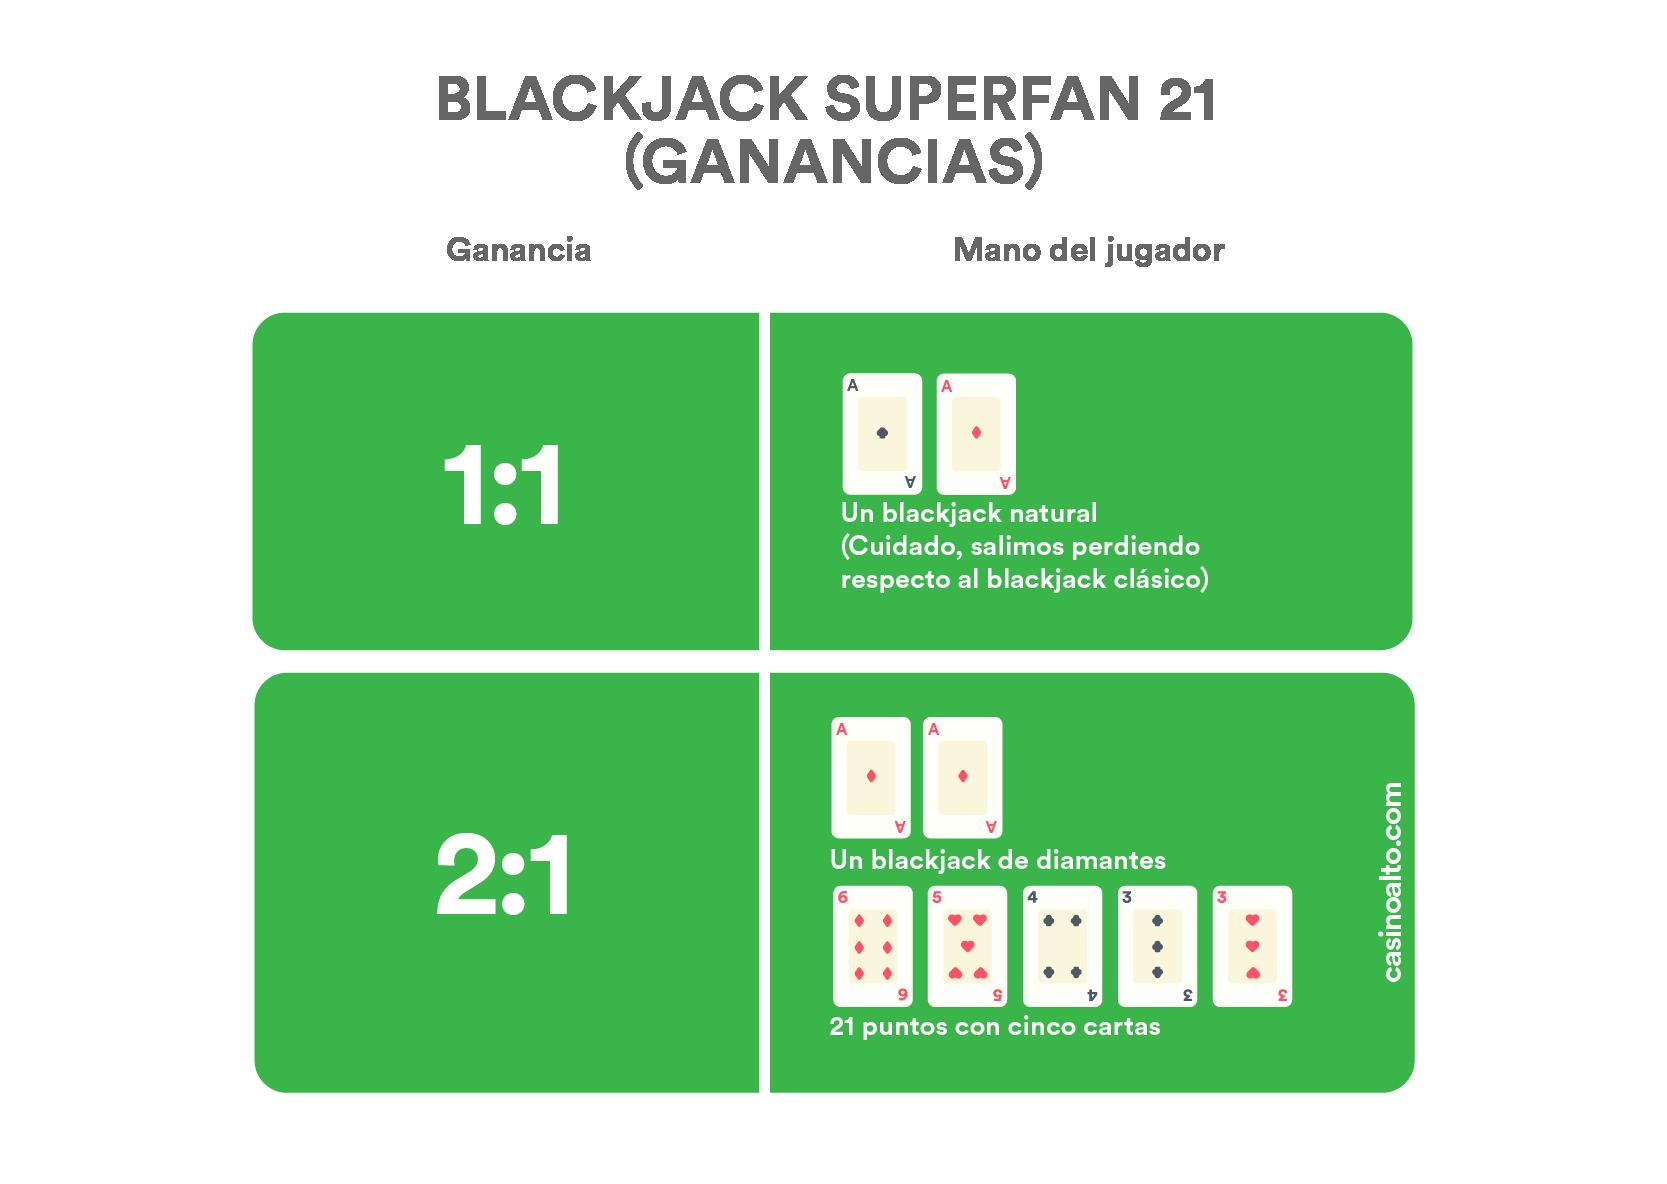 Ganancias blackjack Super Fun 21